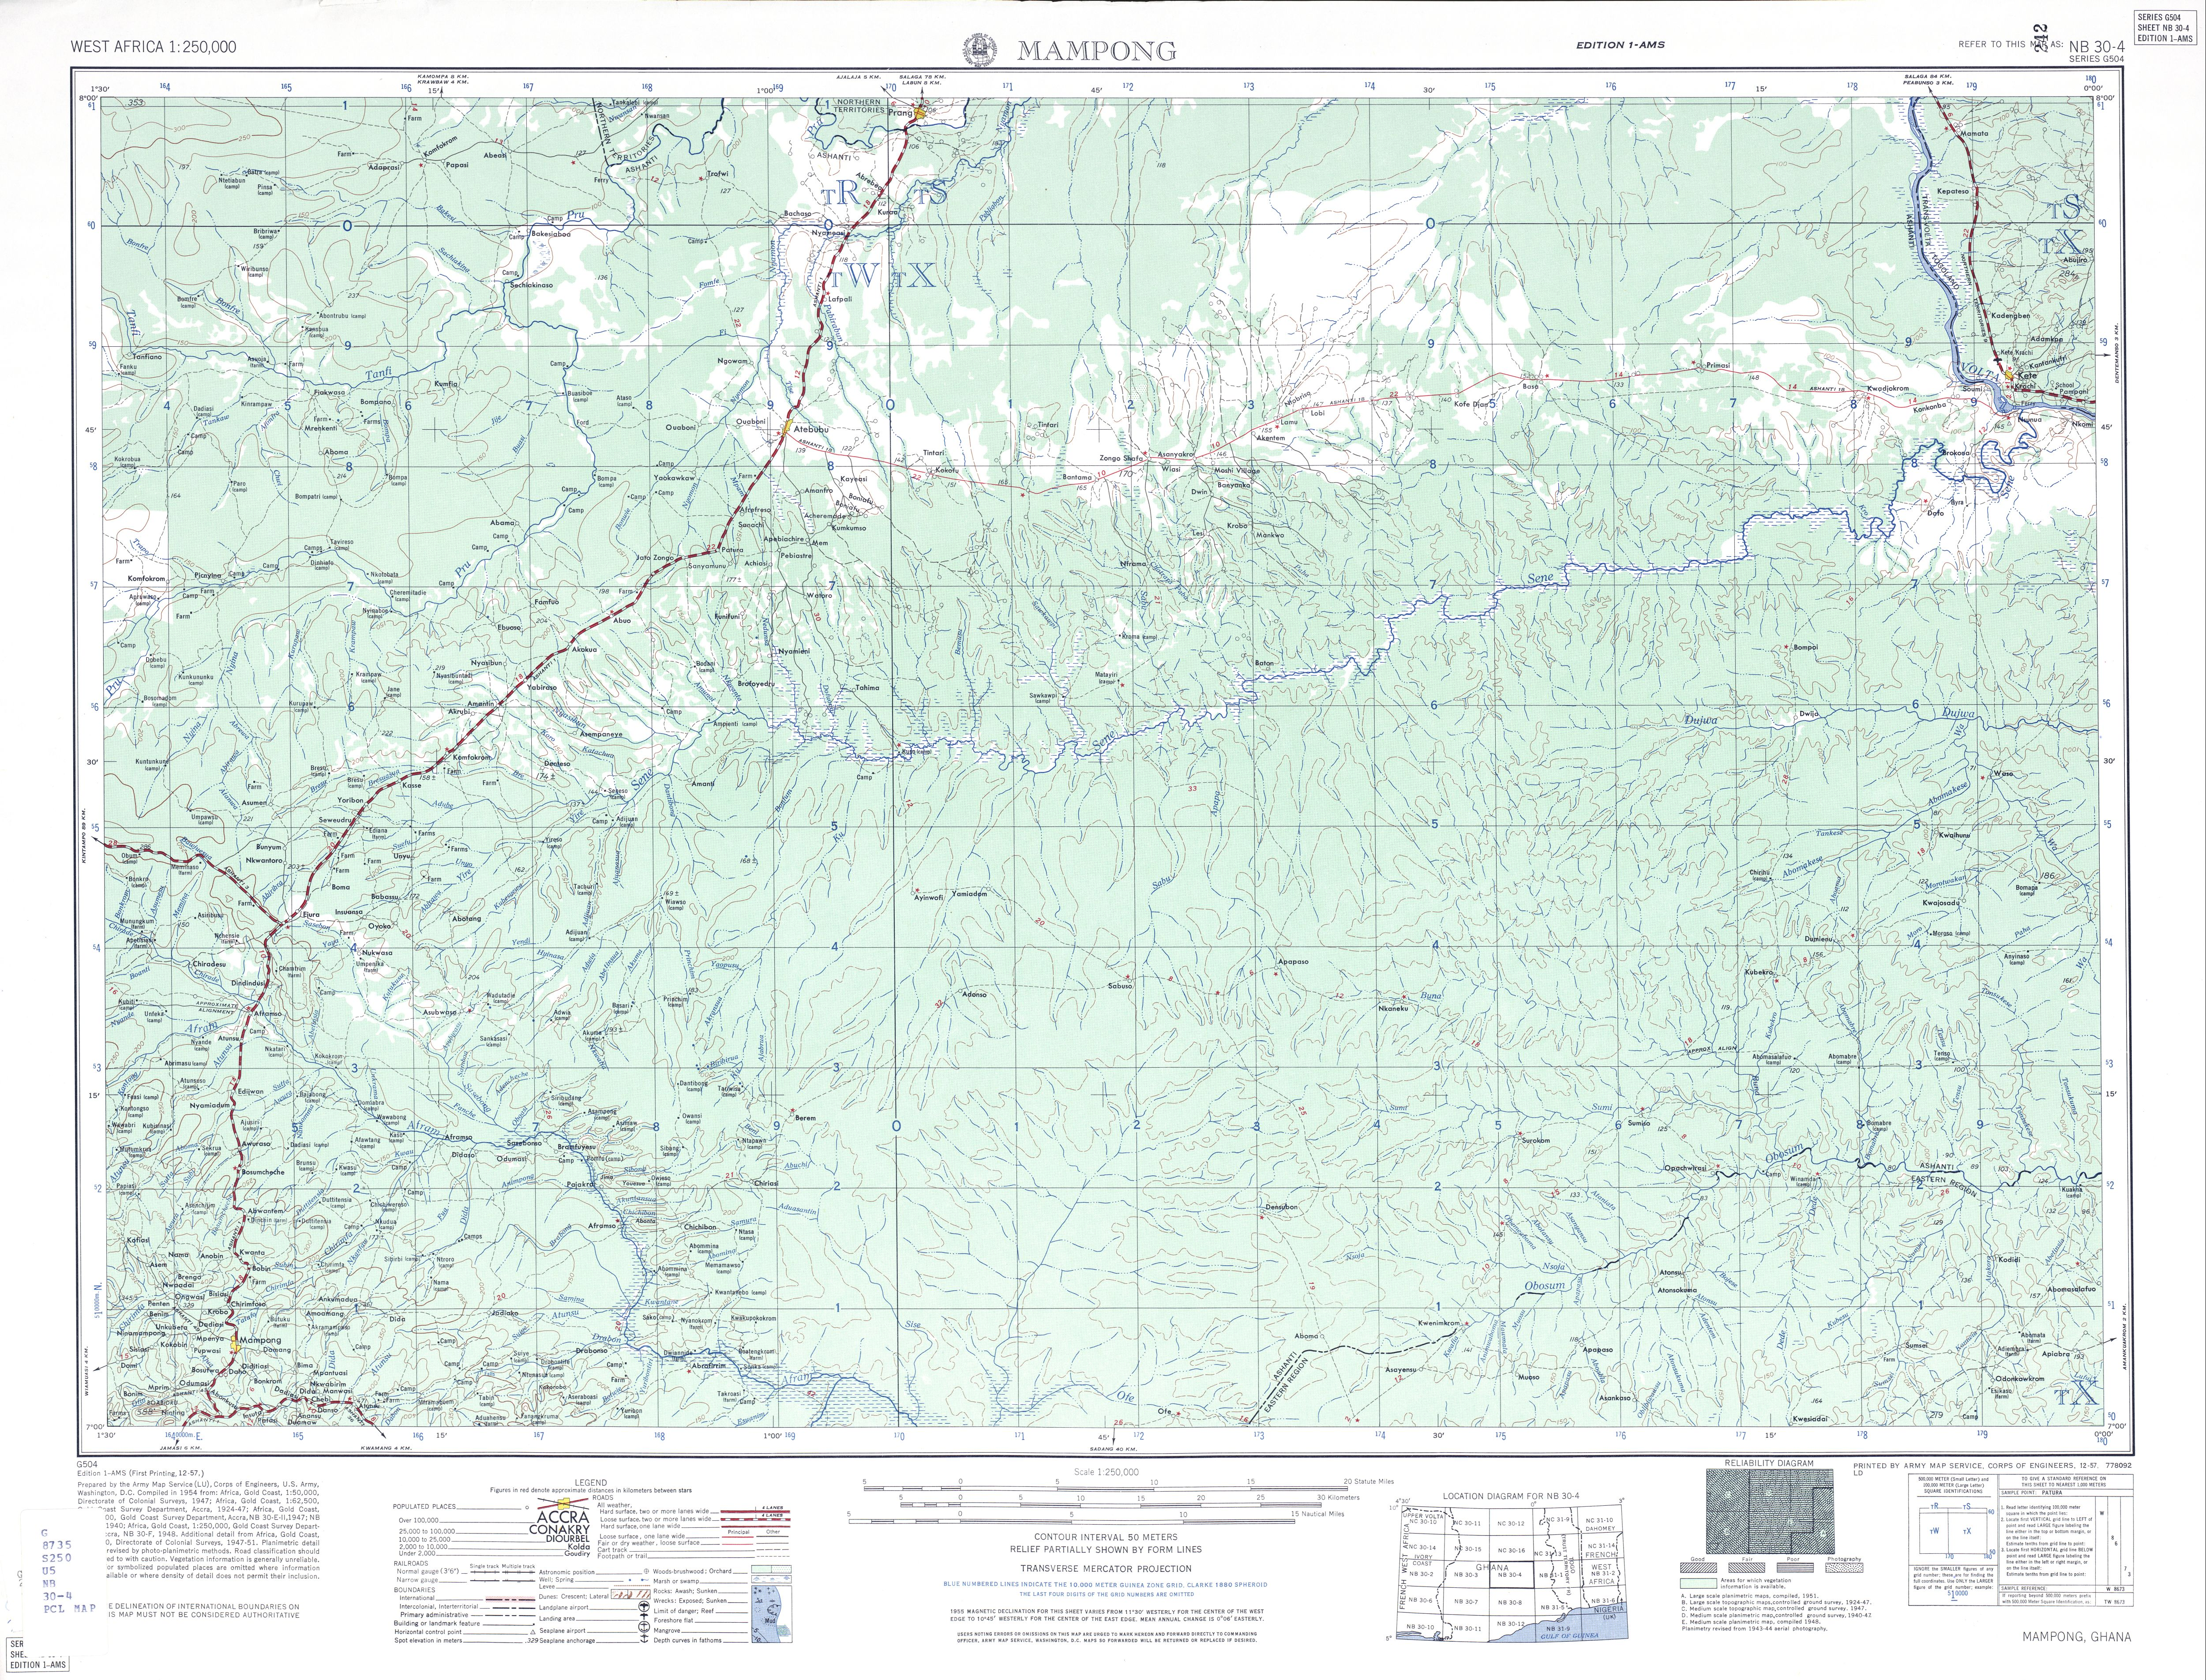 Hoja Mampong del Mapa Topográfico de África Occidental 1955